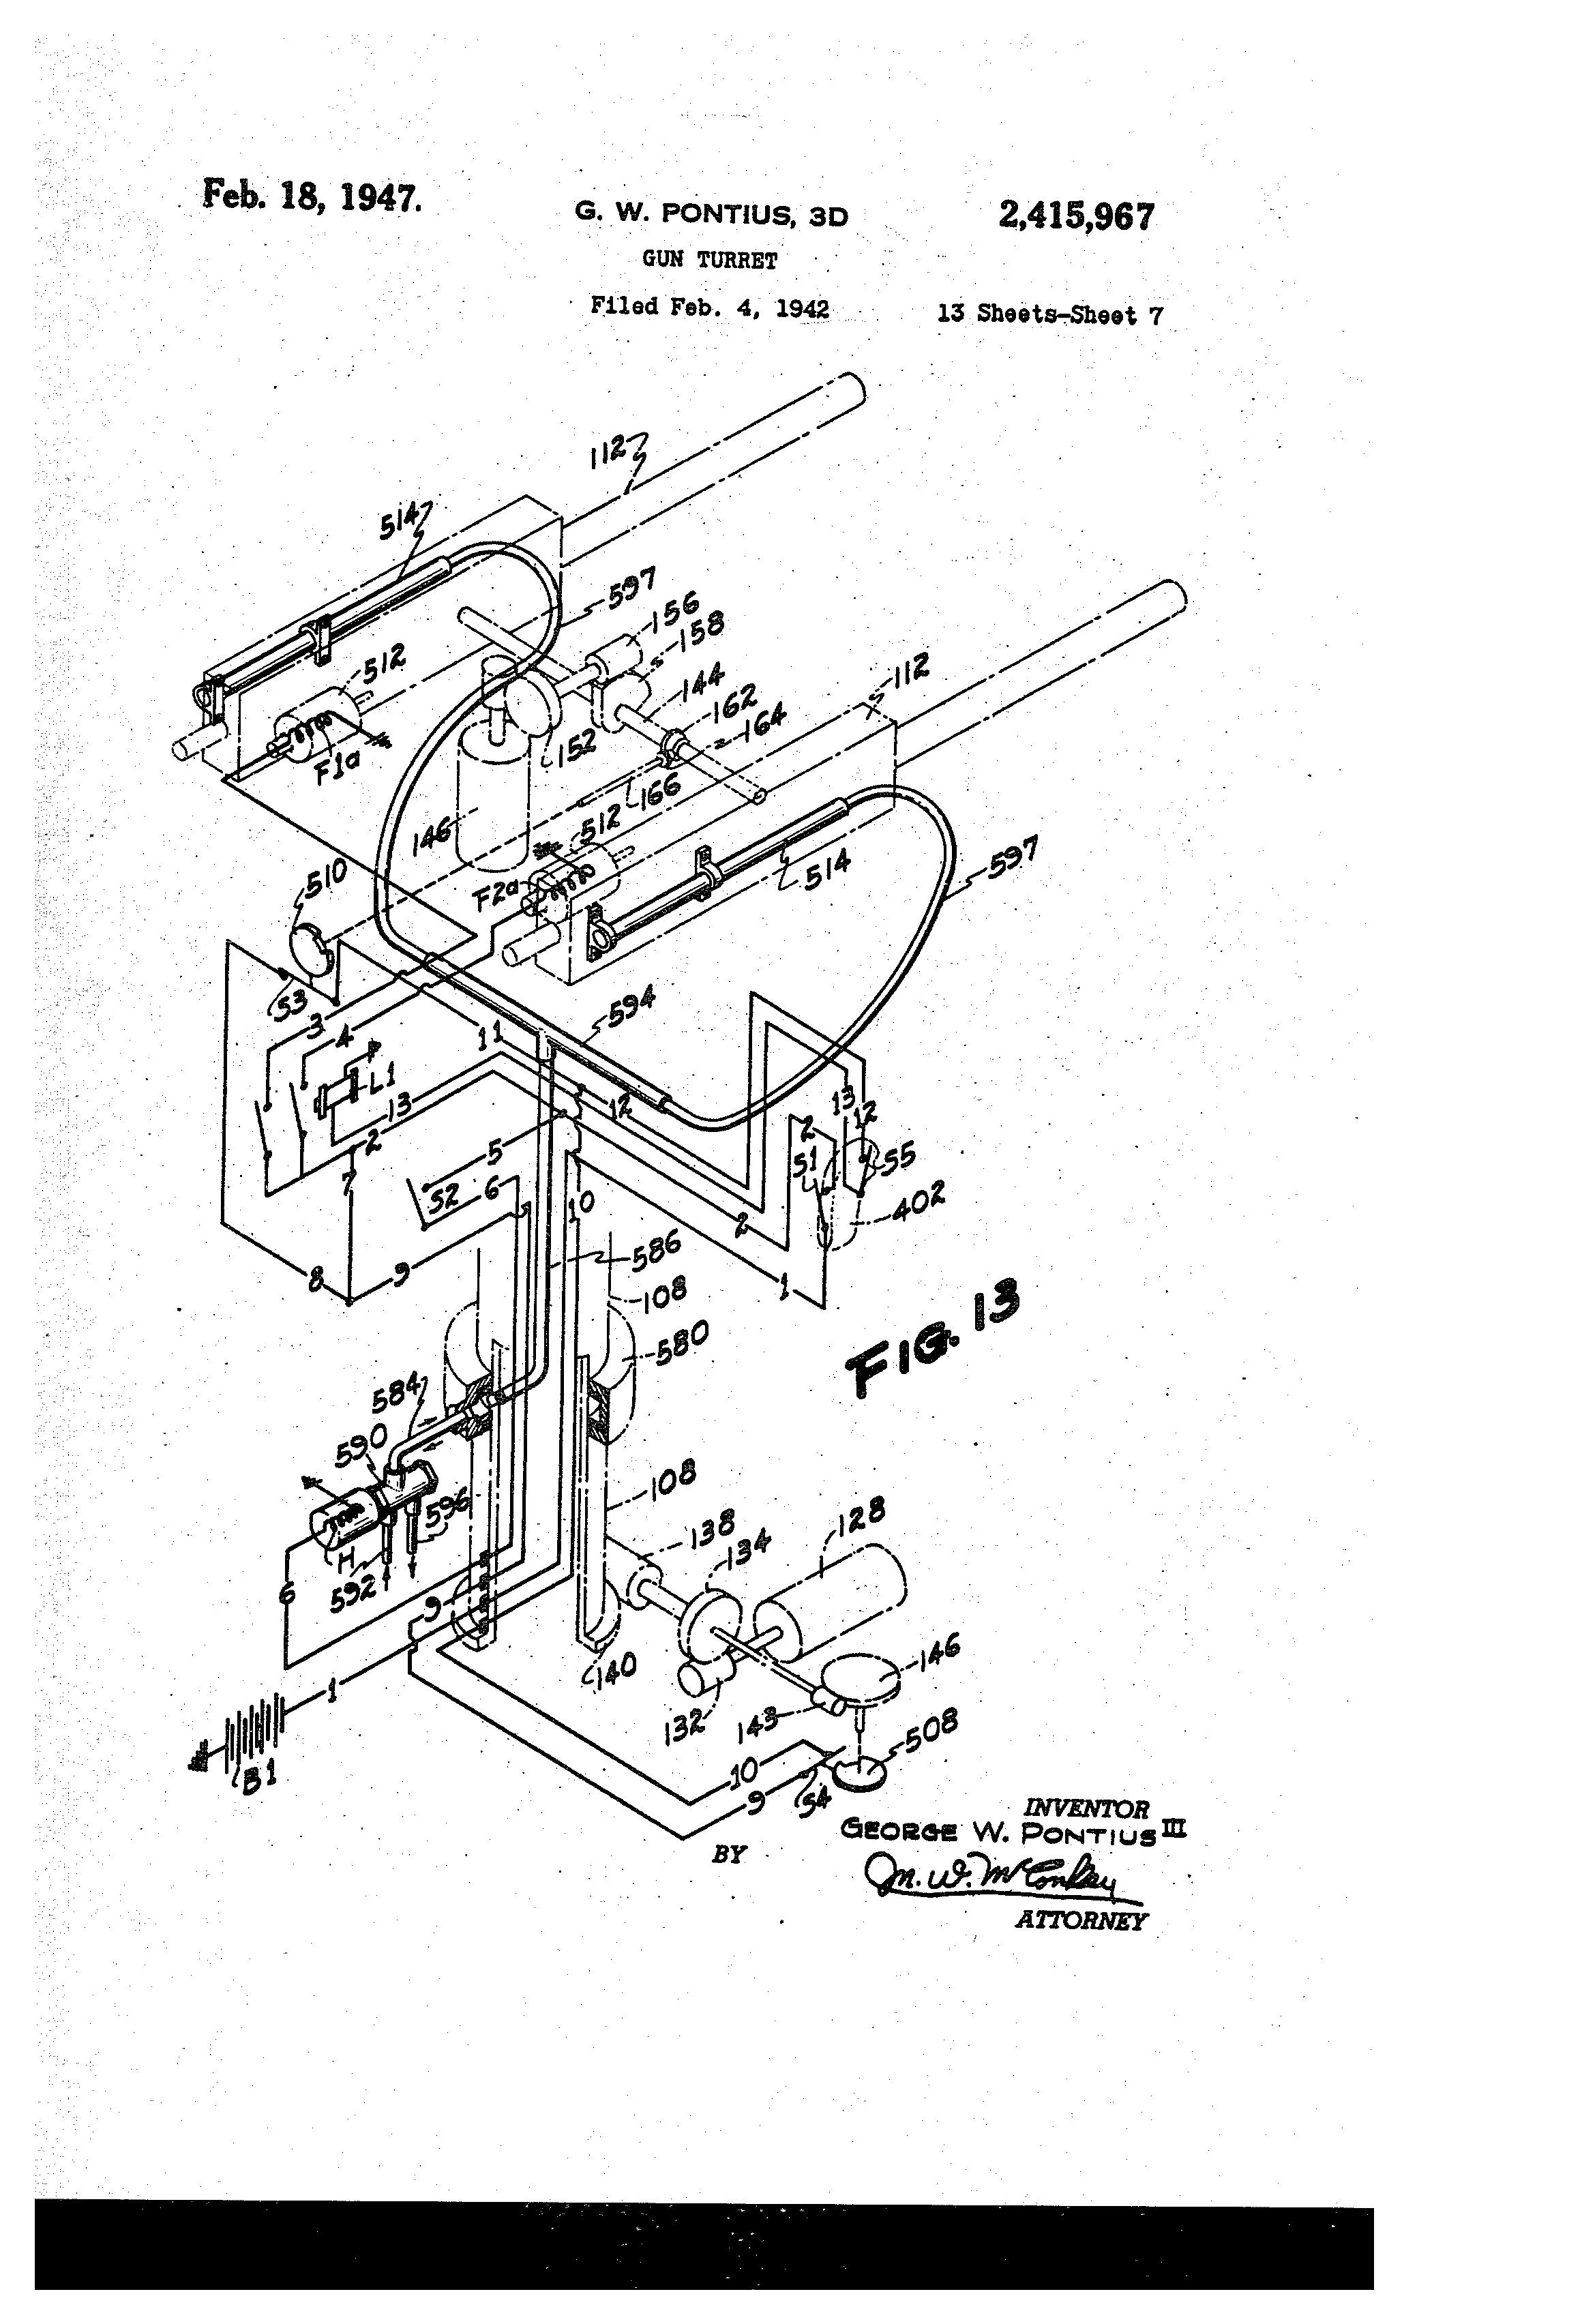 US2415967 6 patent us2415967 gun turret google patents,1953 Solenoid Wiring The 1947 Present Chevrolet Gmc Truck